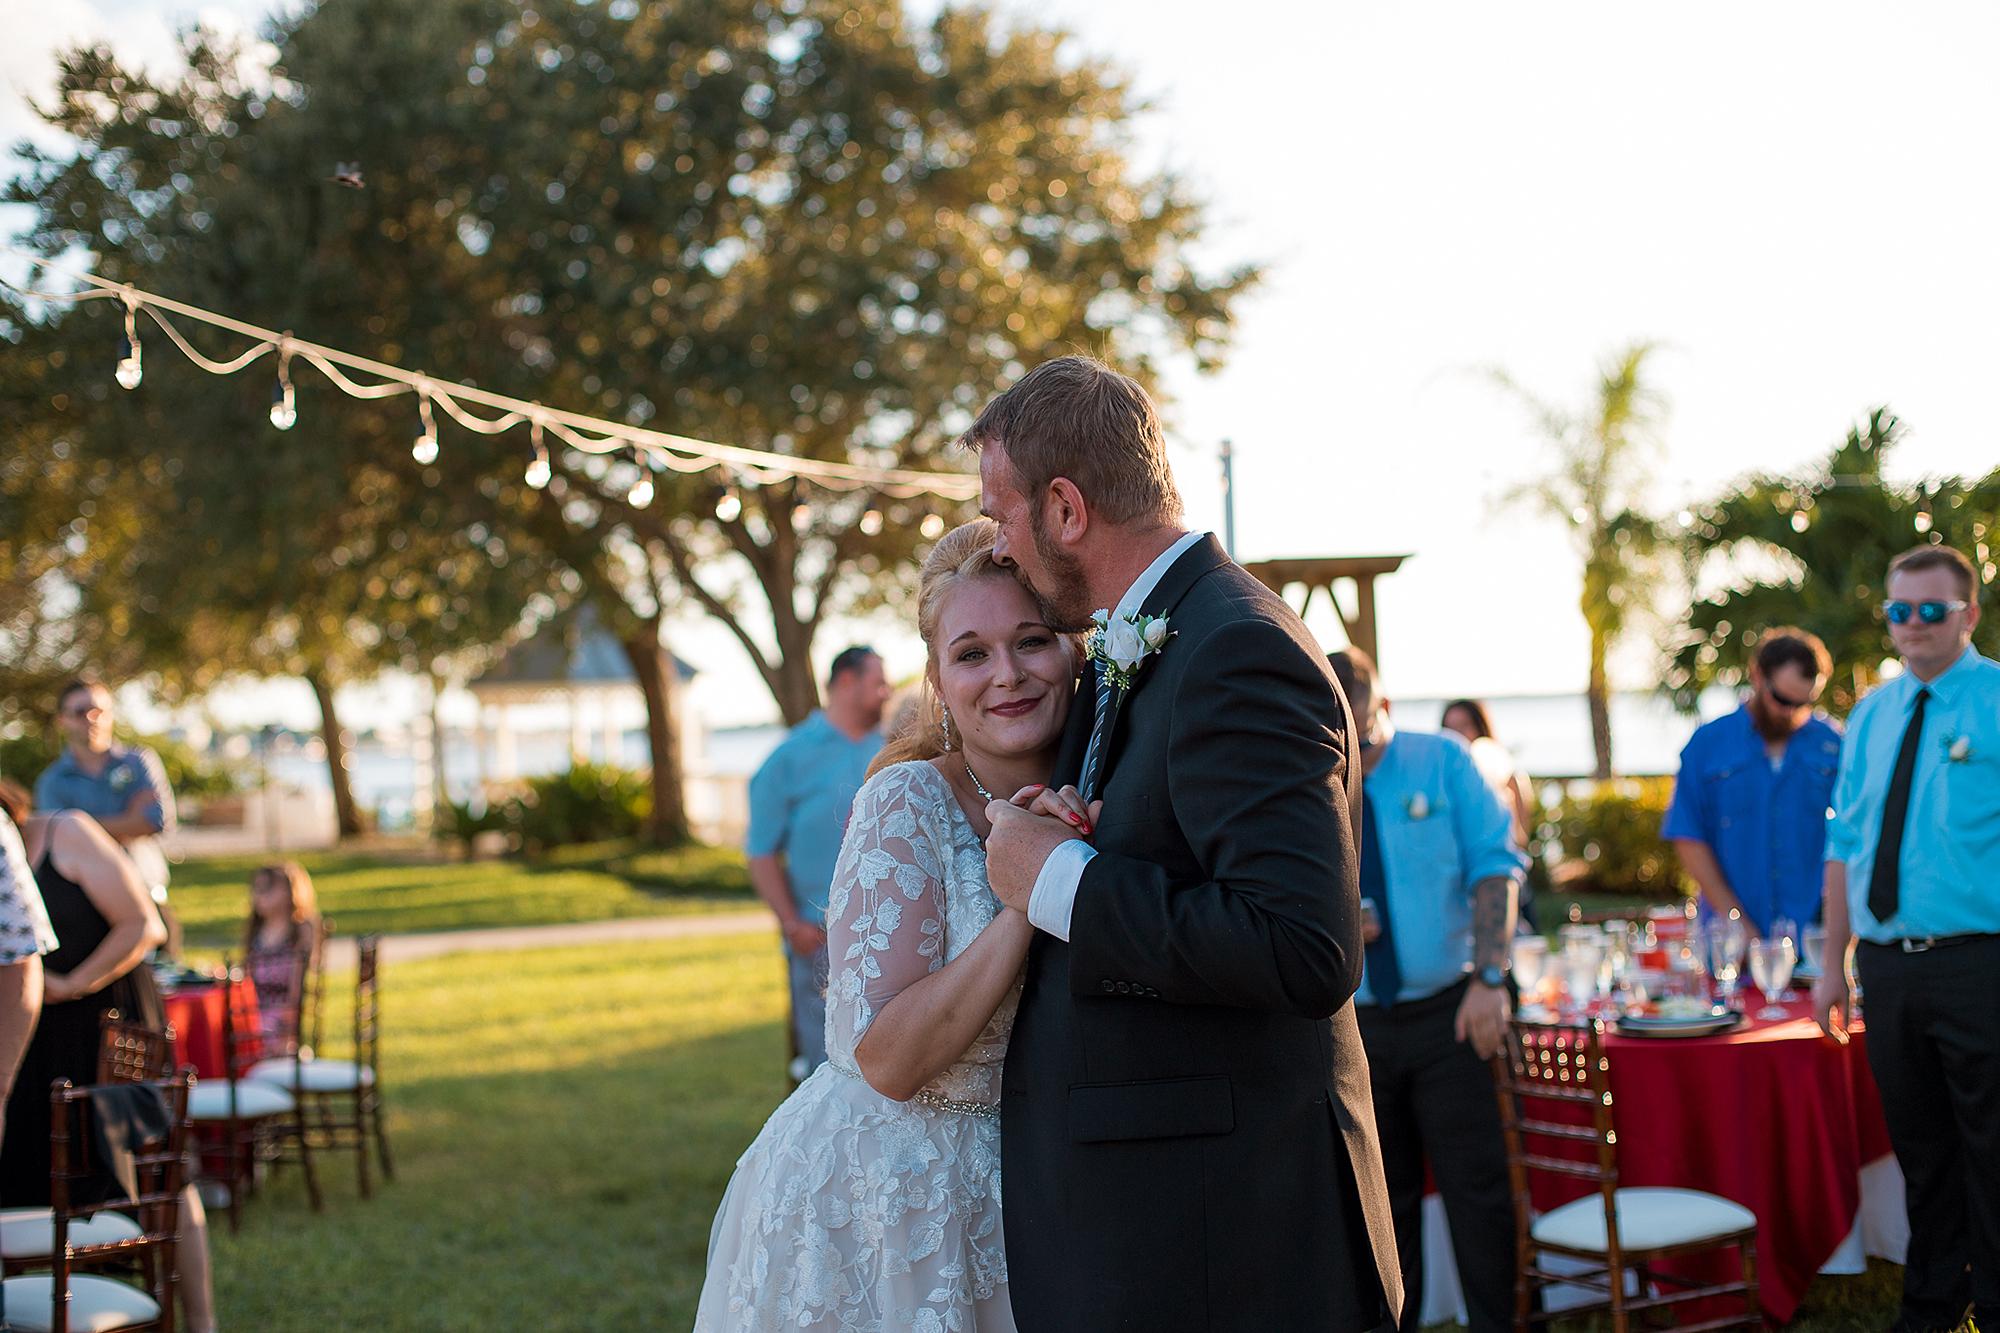 Tampa, FL Wedding 10/13/19